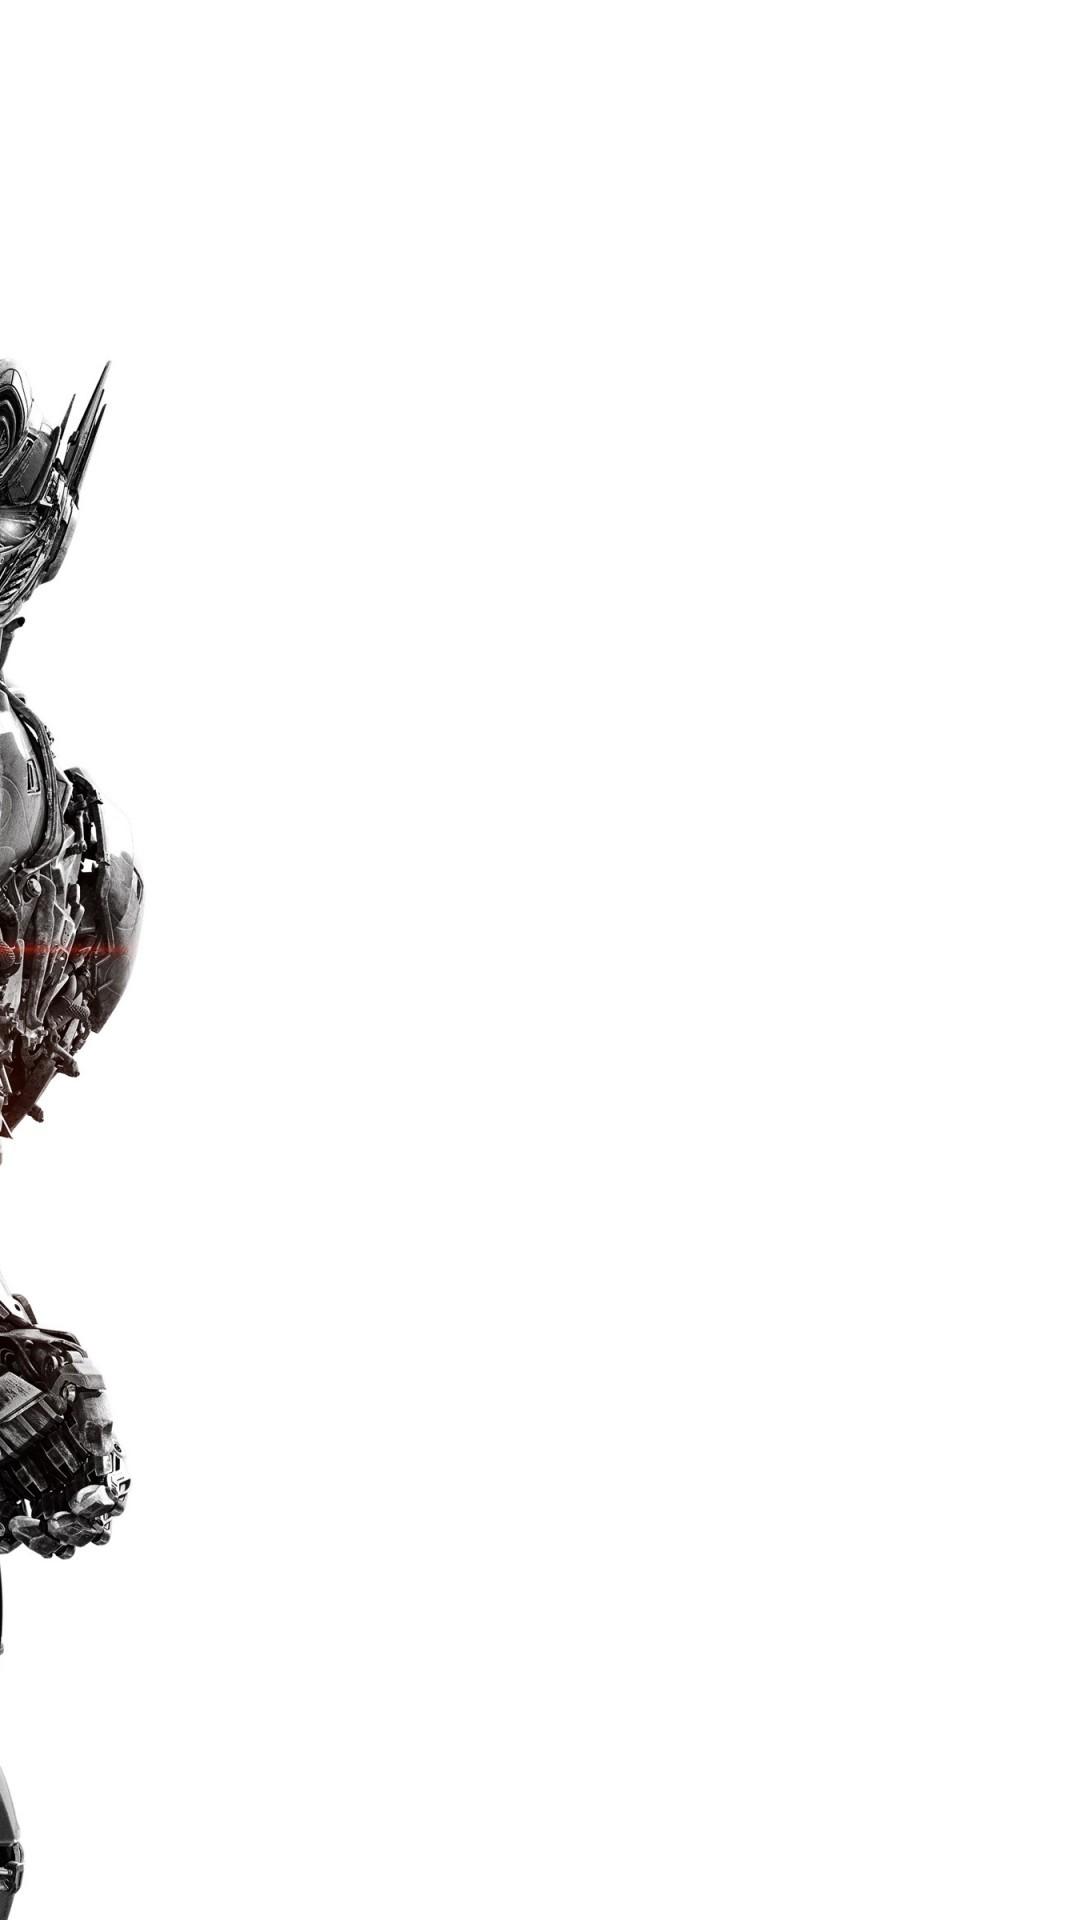 The Last Knight, Optimus Prime, Sword - Optimus Prime Iphone Transformers - HD Wallpaper